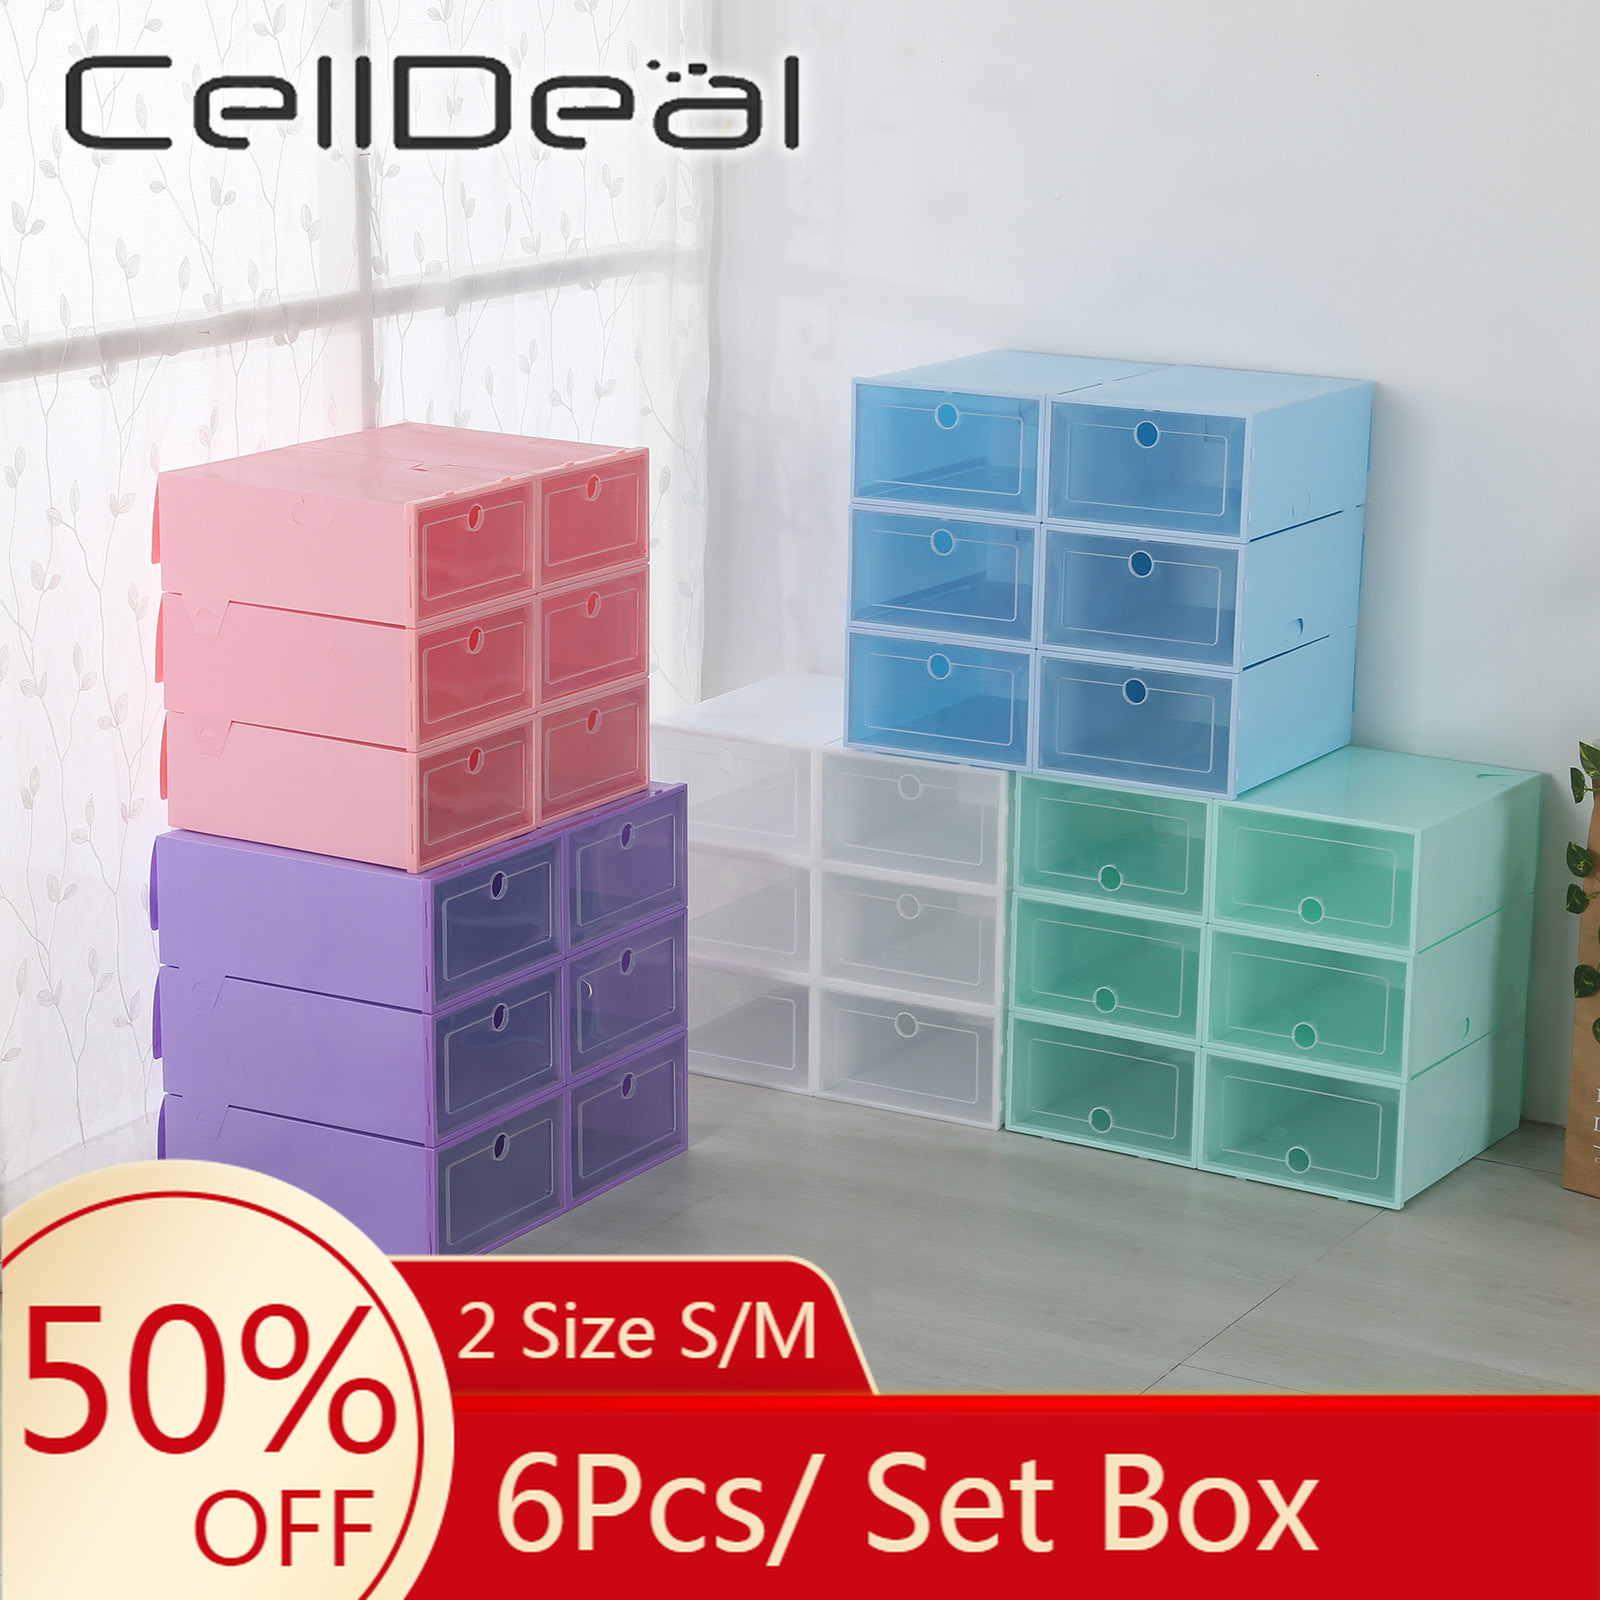 6Pcs/Set Foldable Shoe Box Transparent Plastic Shoe Rack Storage Bins Drawers Combination Flip Cover Room Organizer Shoe Hanger